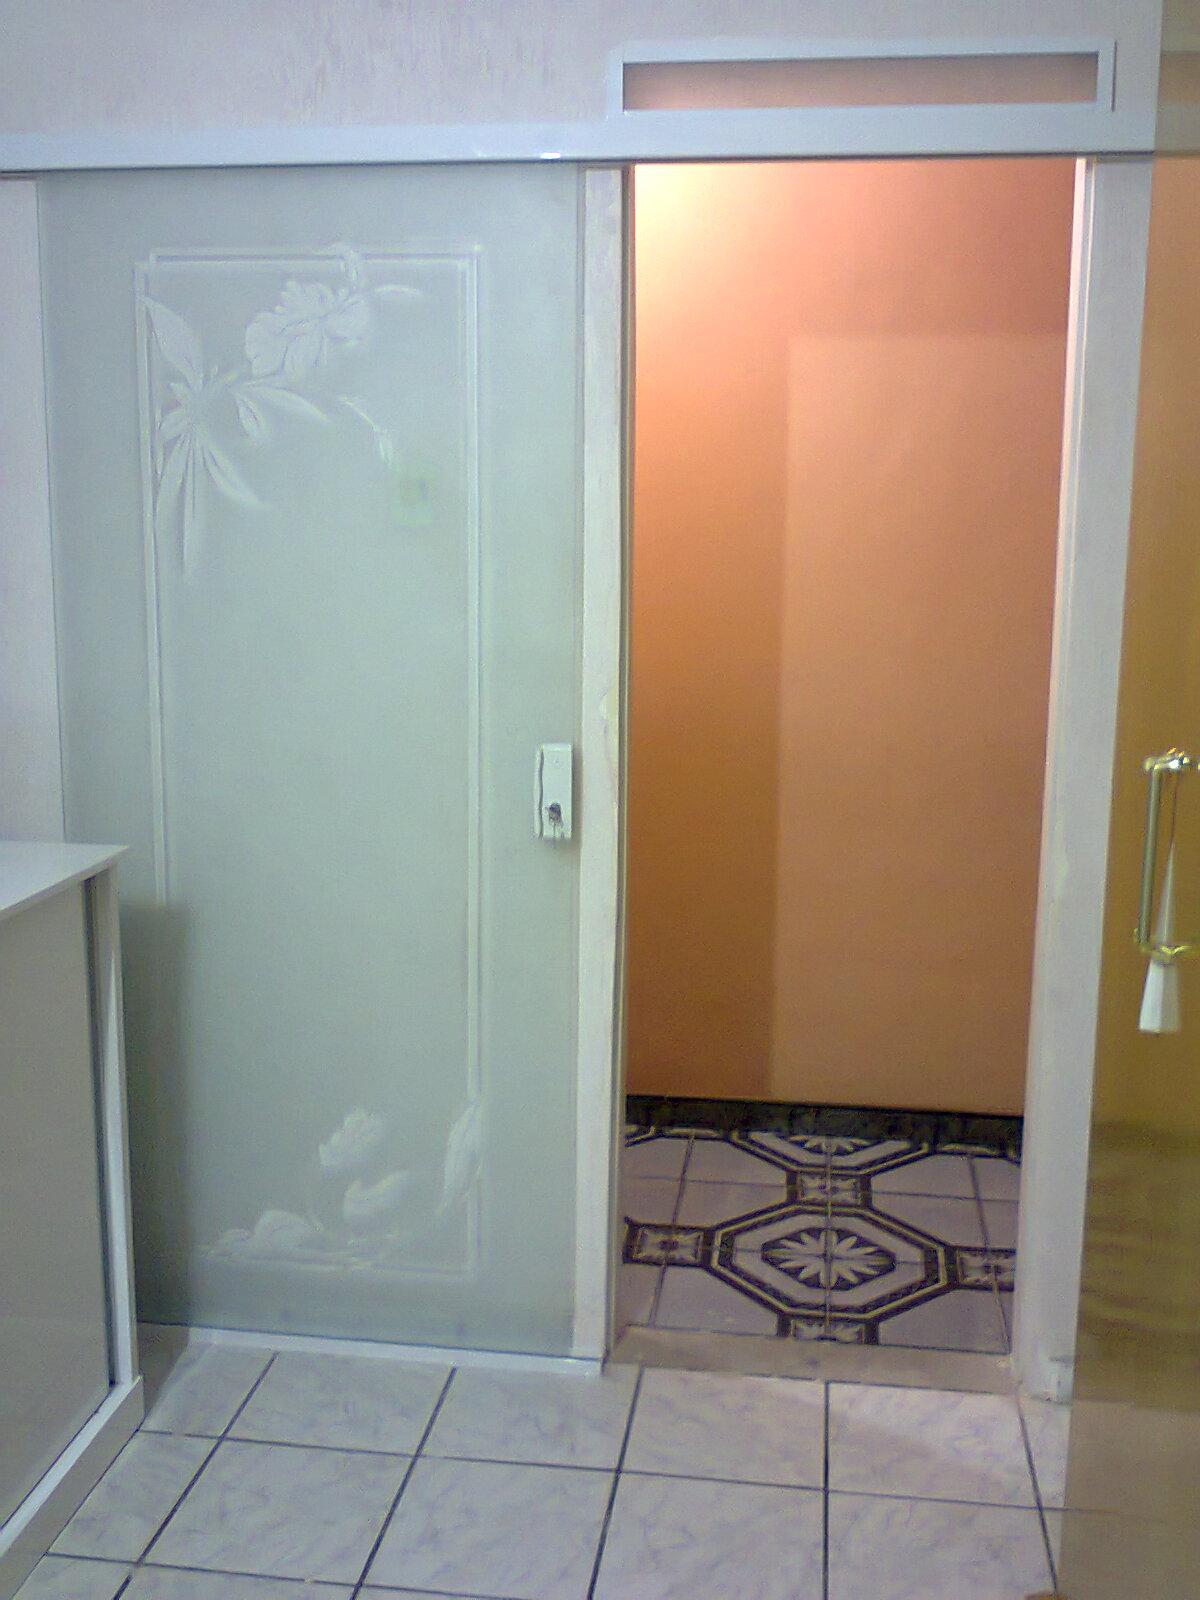 Porta de correr decorada em vidro jateado #B04F1B 1200 1600